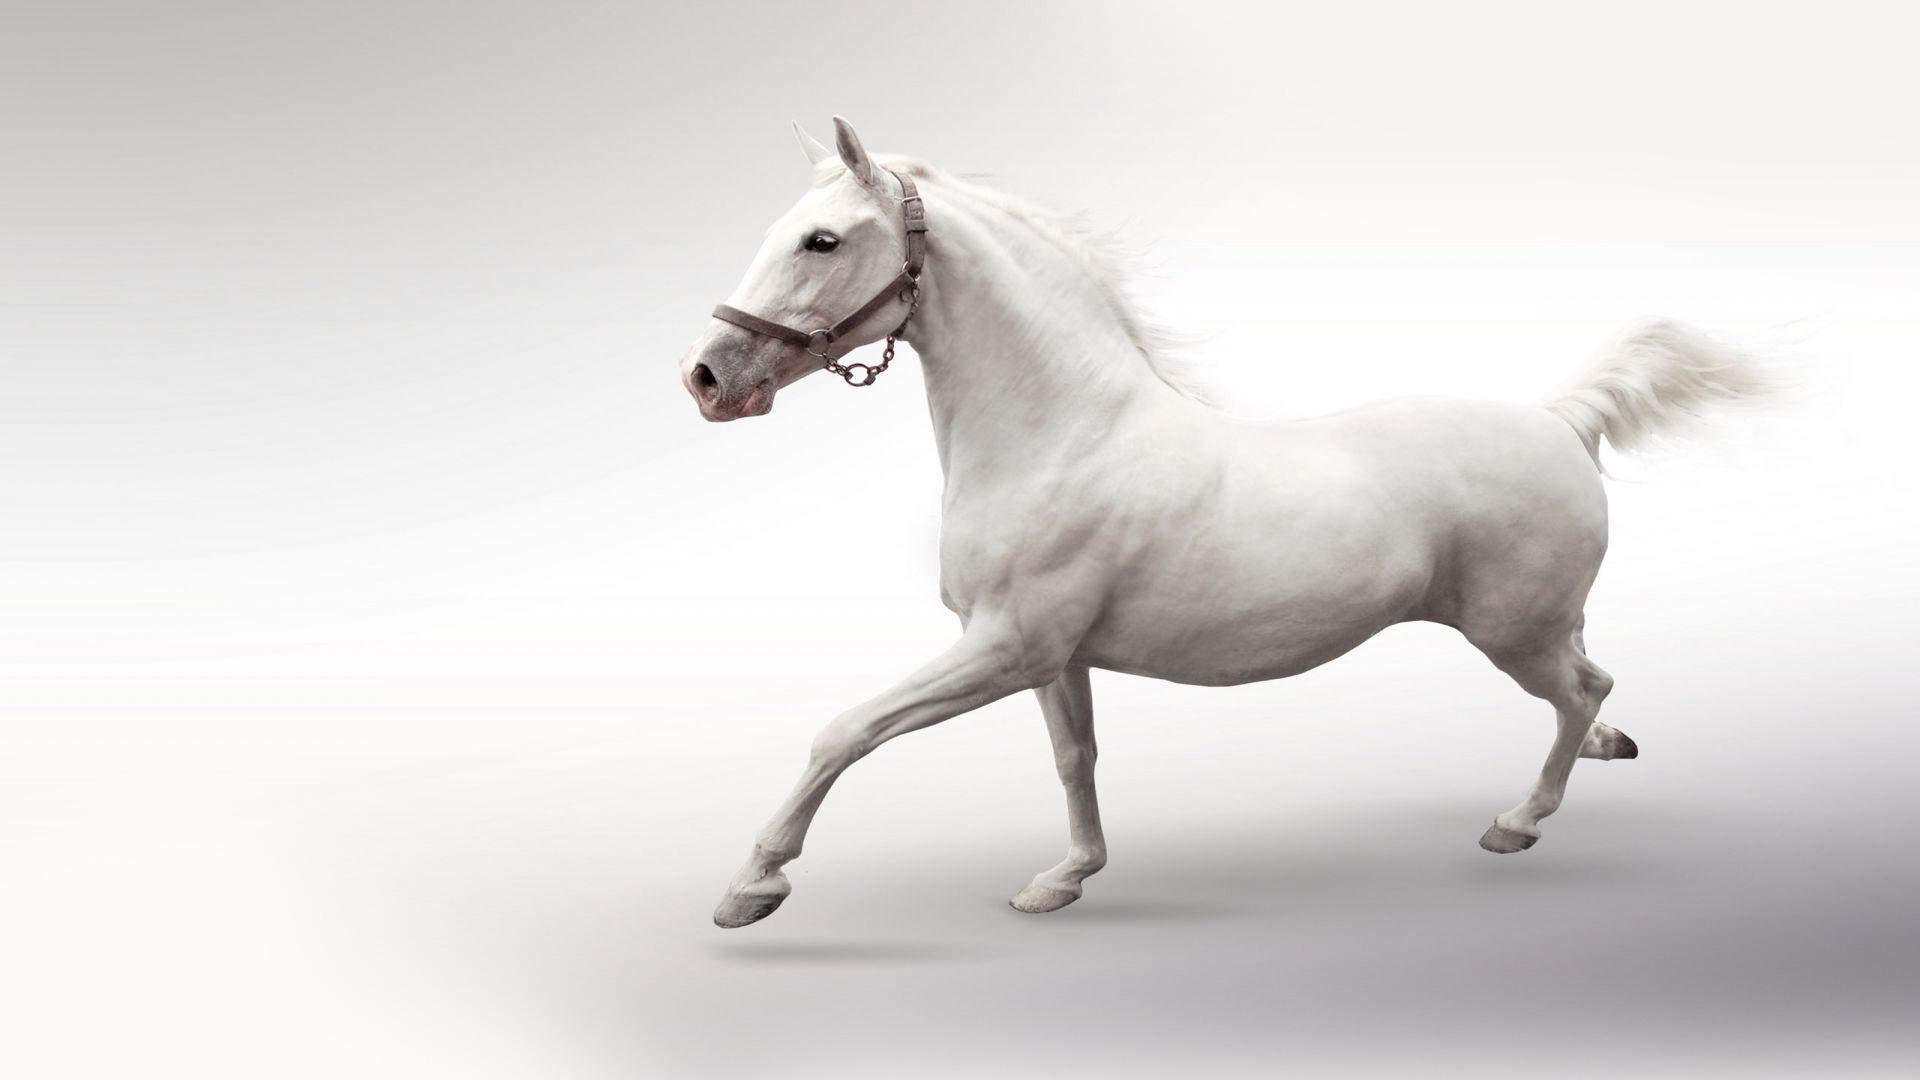 White Horse Wallpaper Wallpapersafari